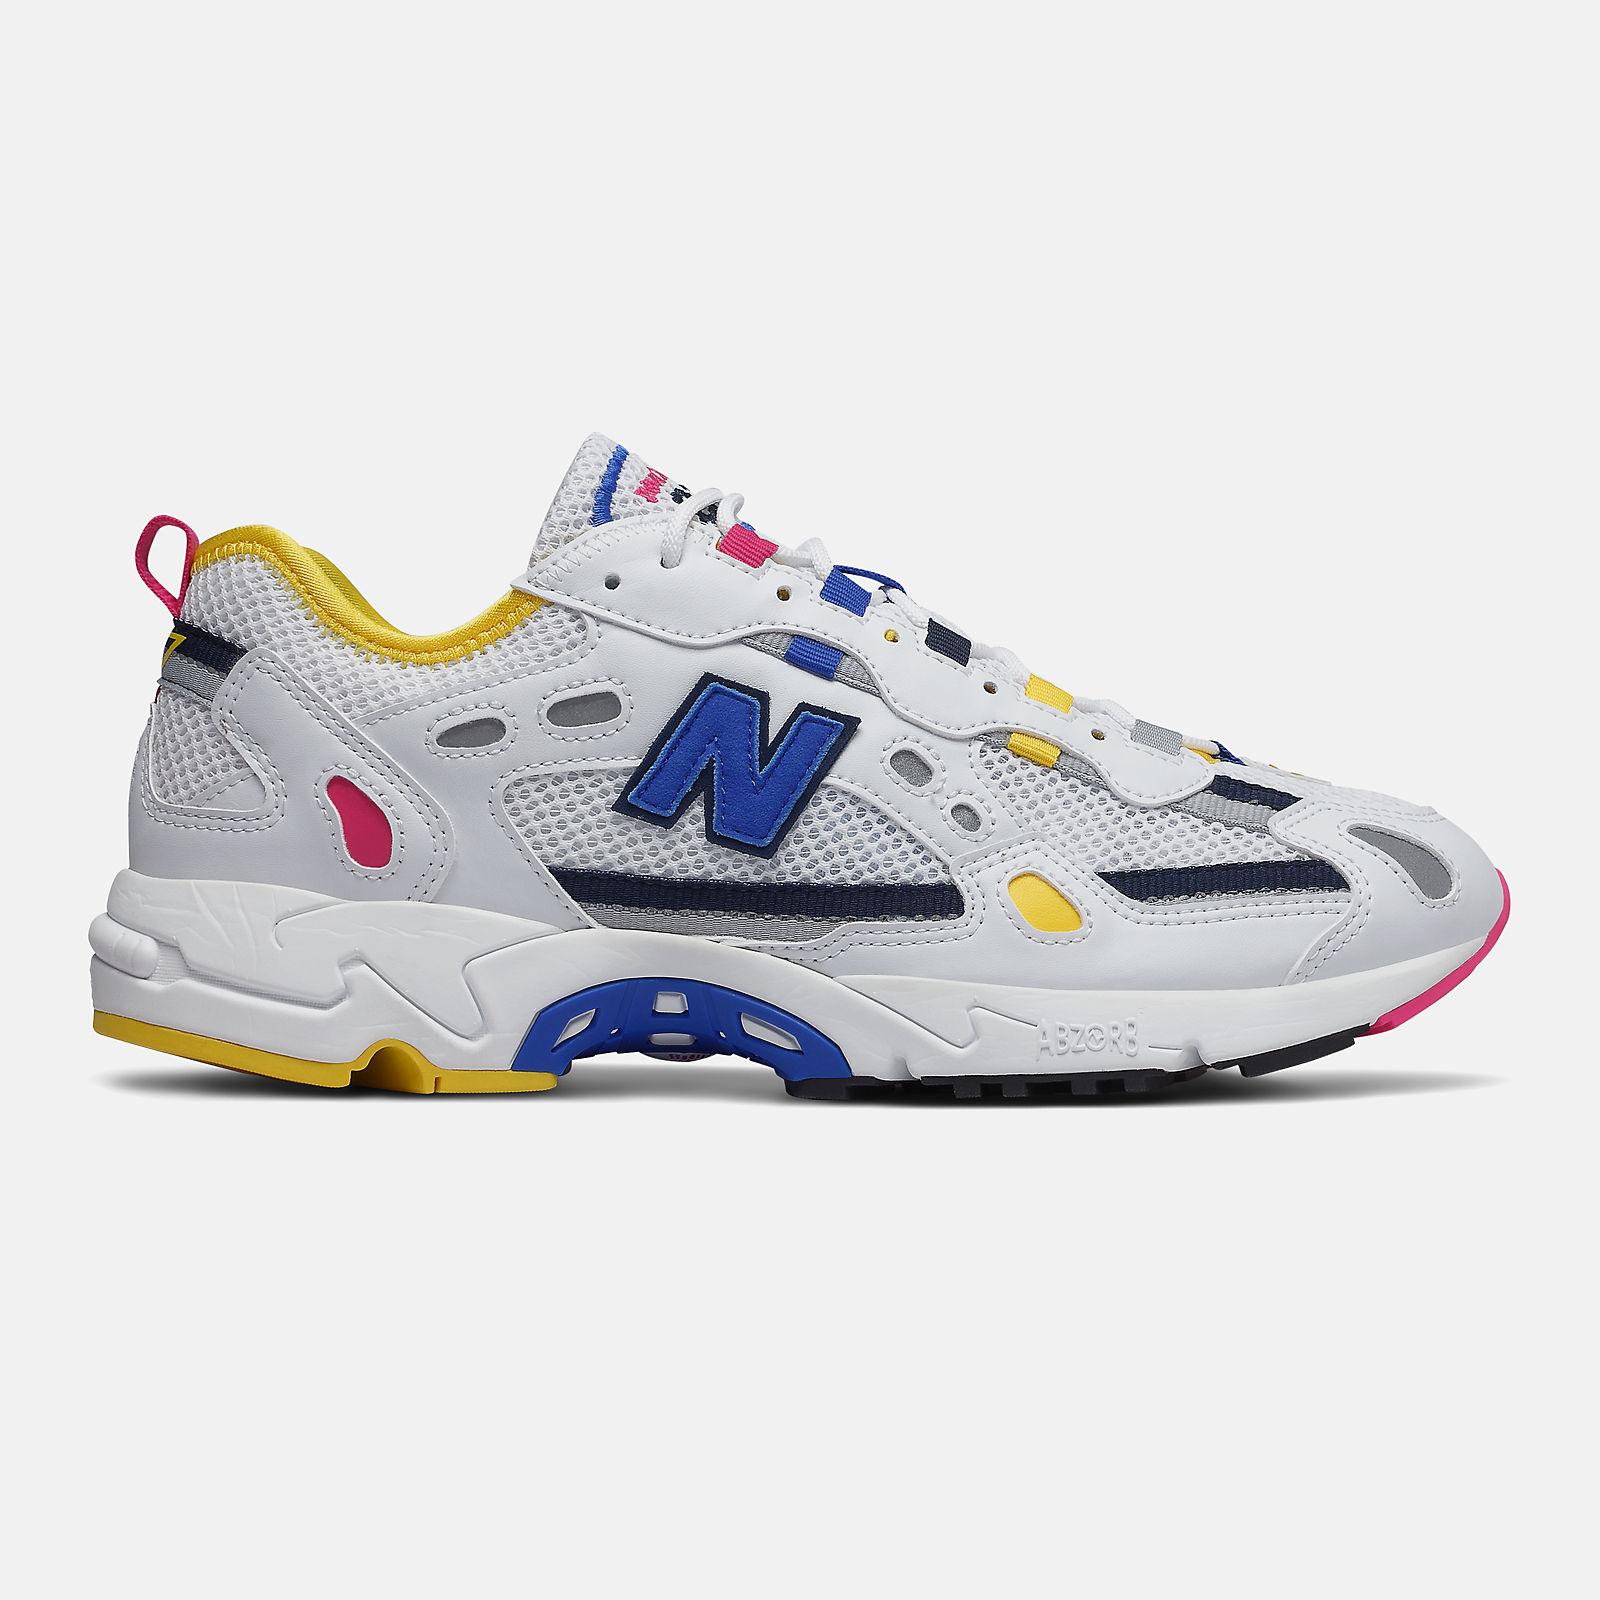 Men's 827 Lifestyle Shoes - New Balance